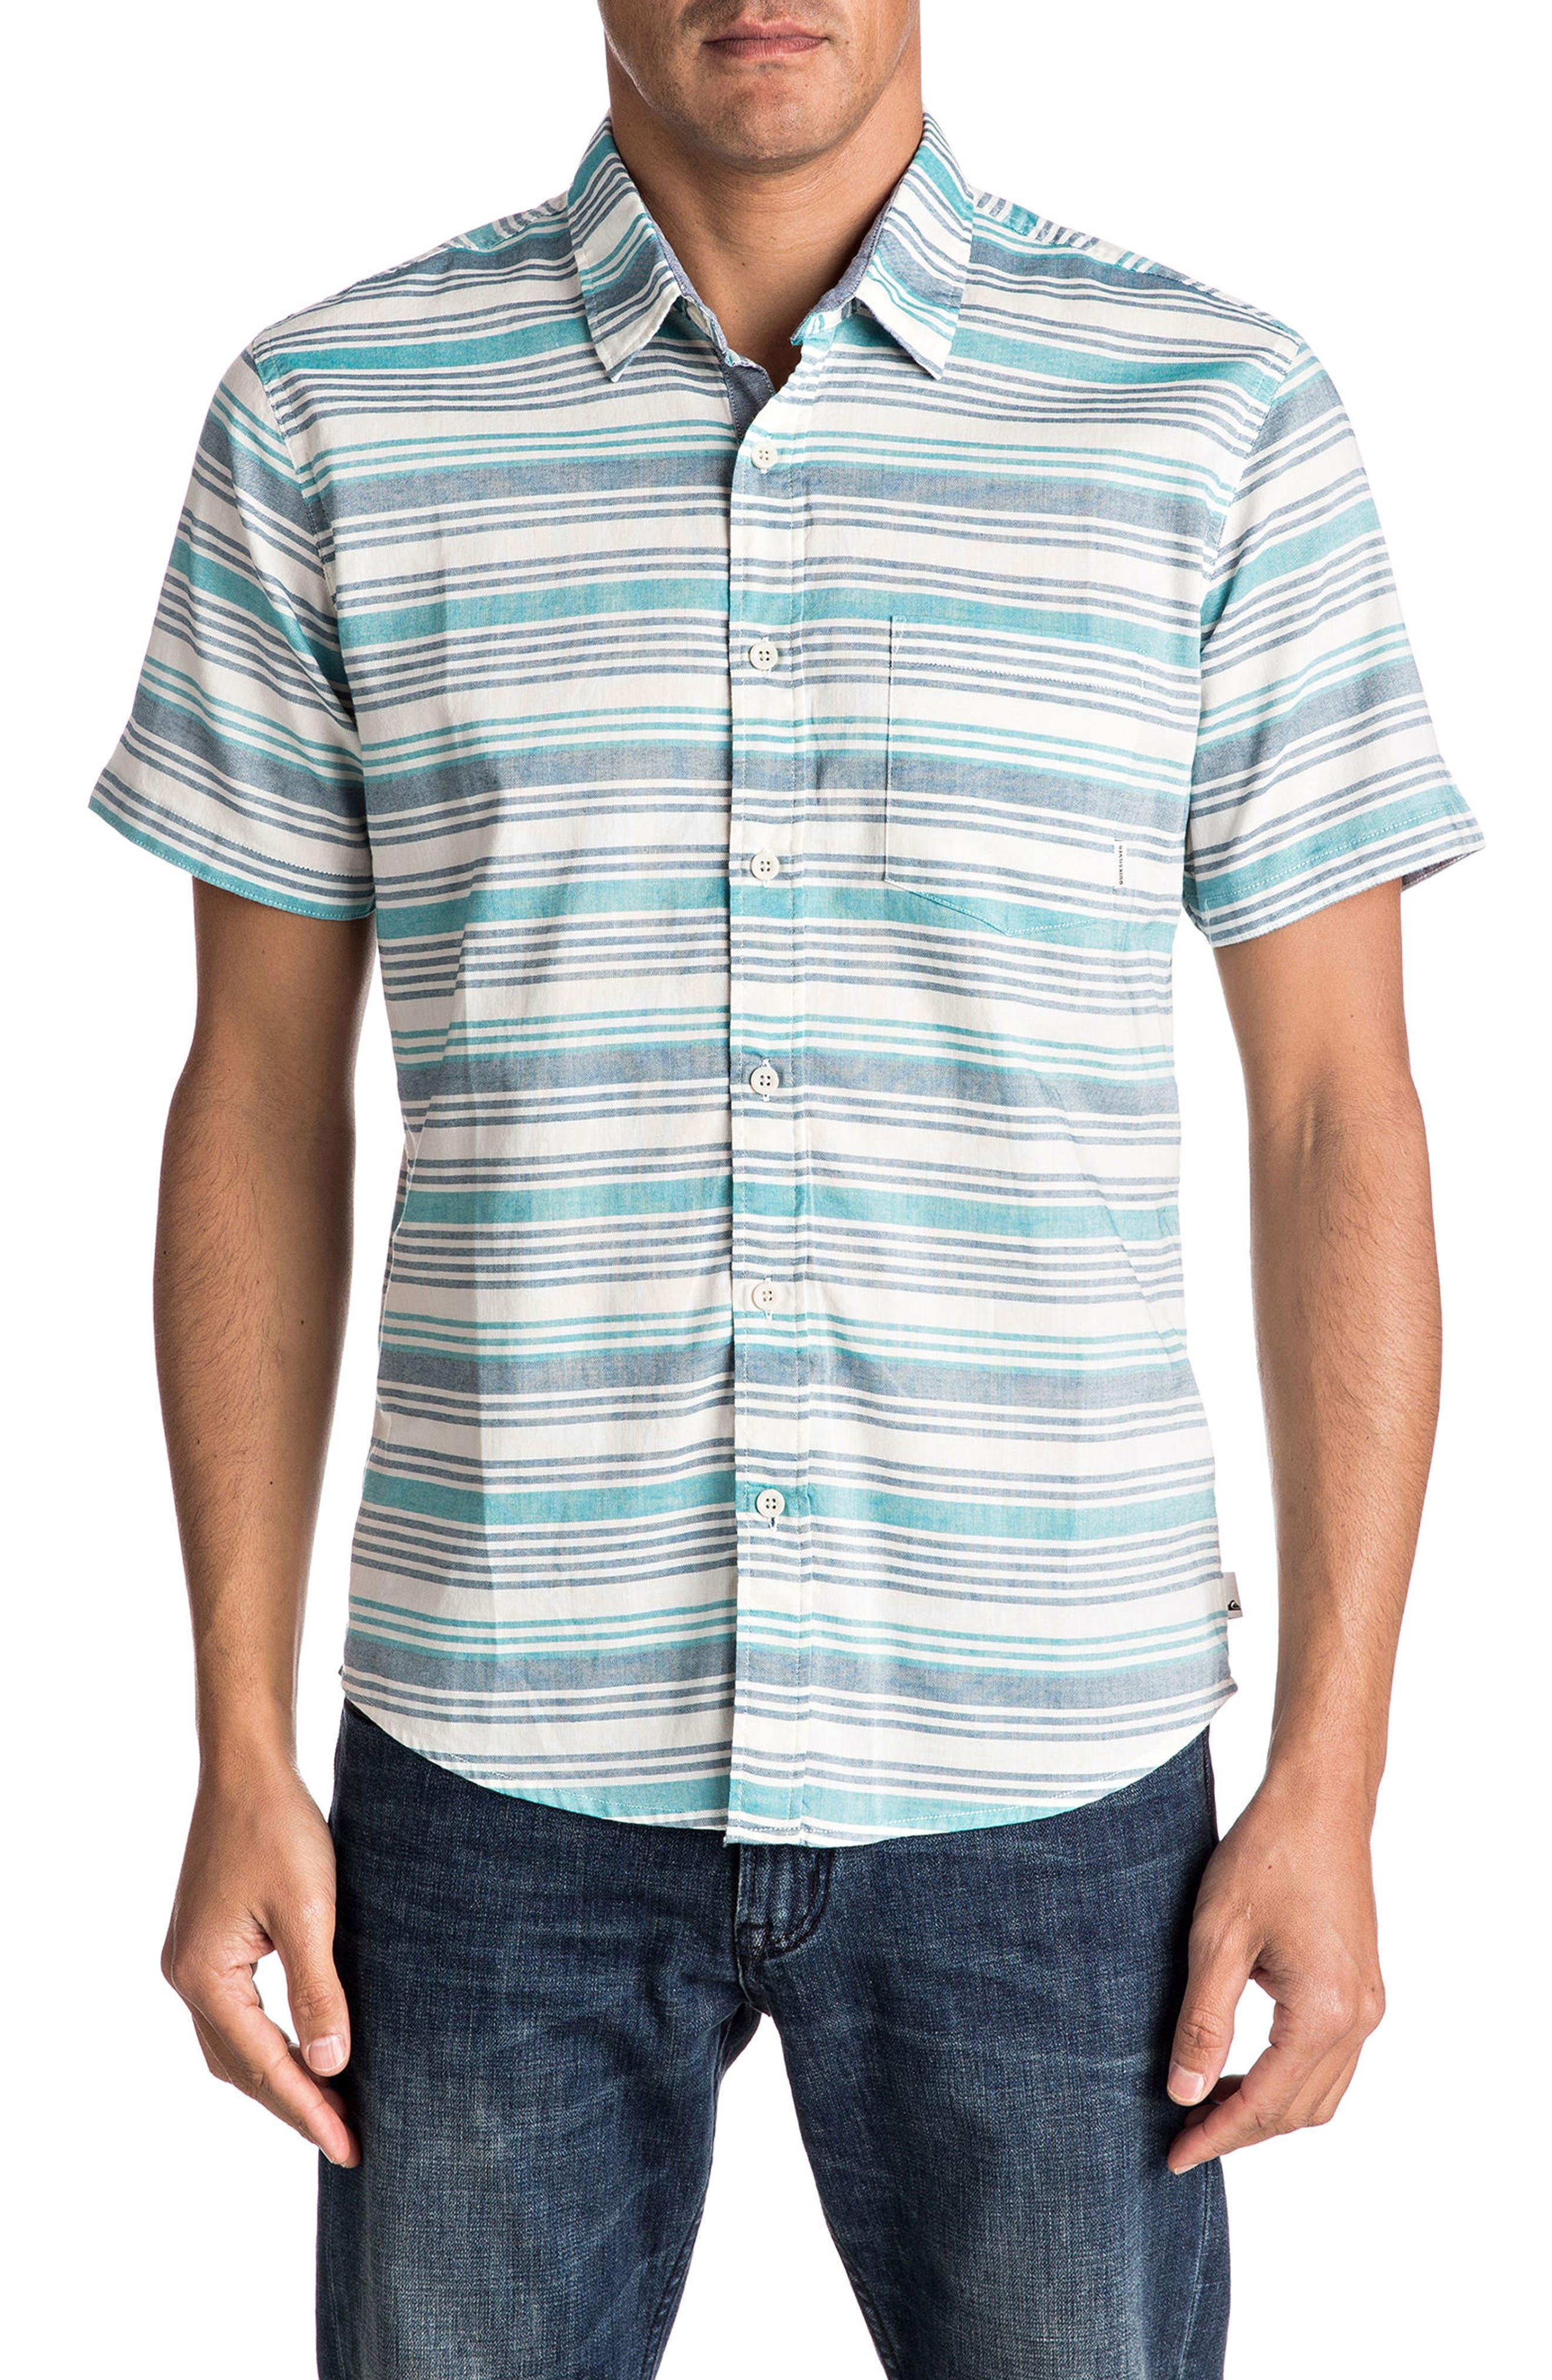 Quiksilver Men/'s The Aventail Shirt